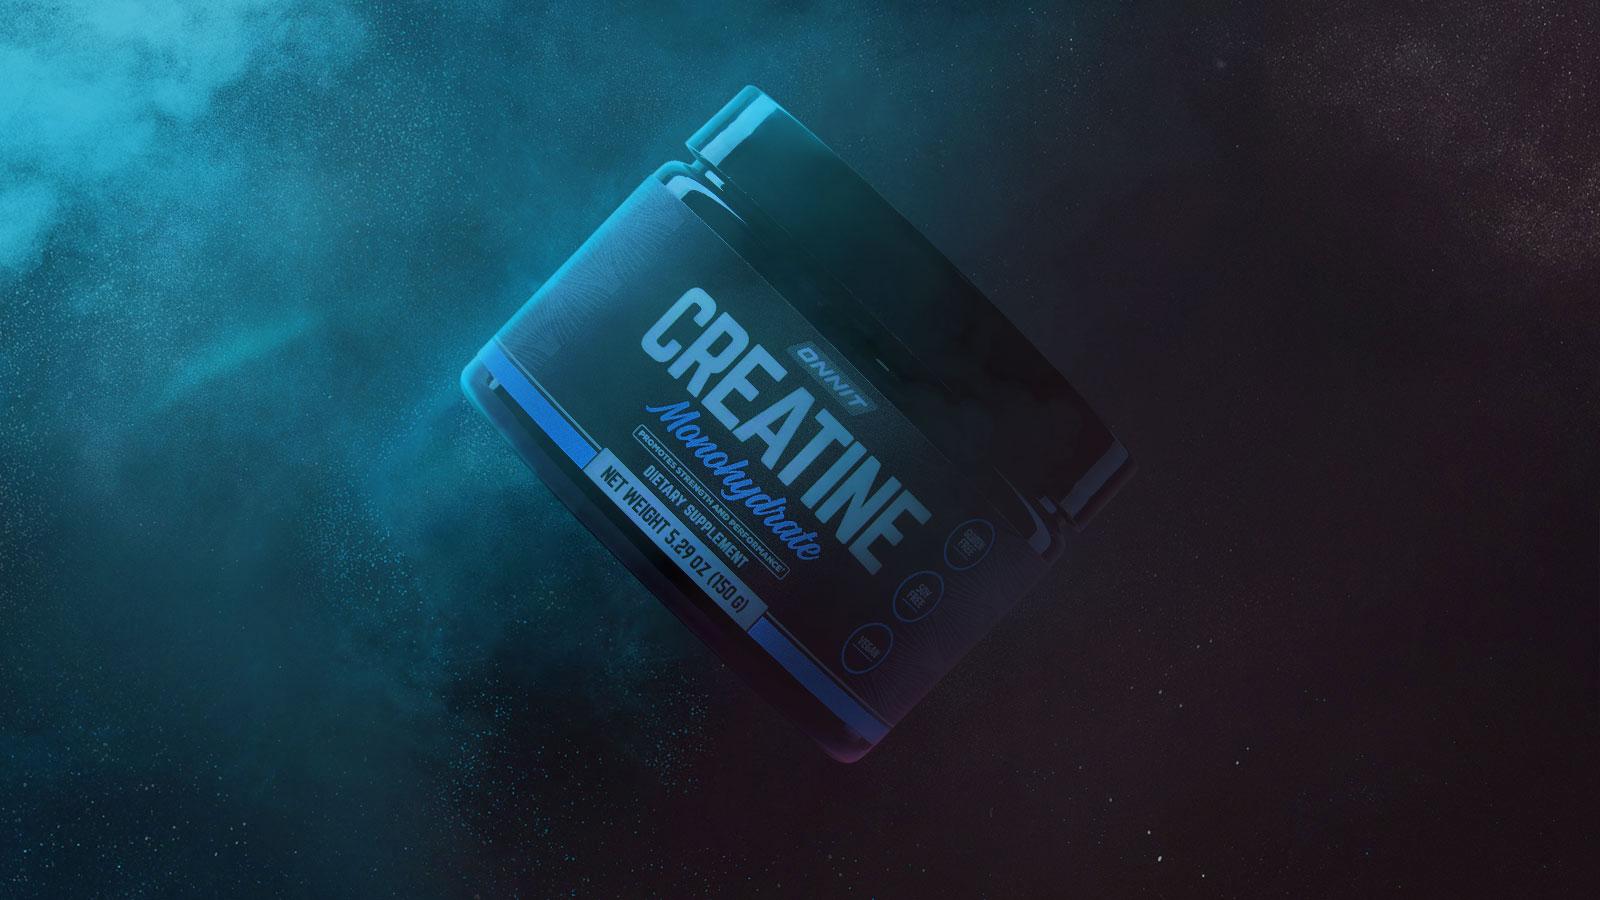 Tub of Creatine